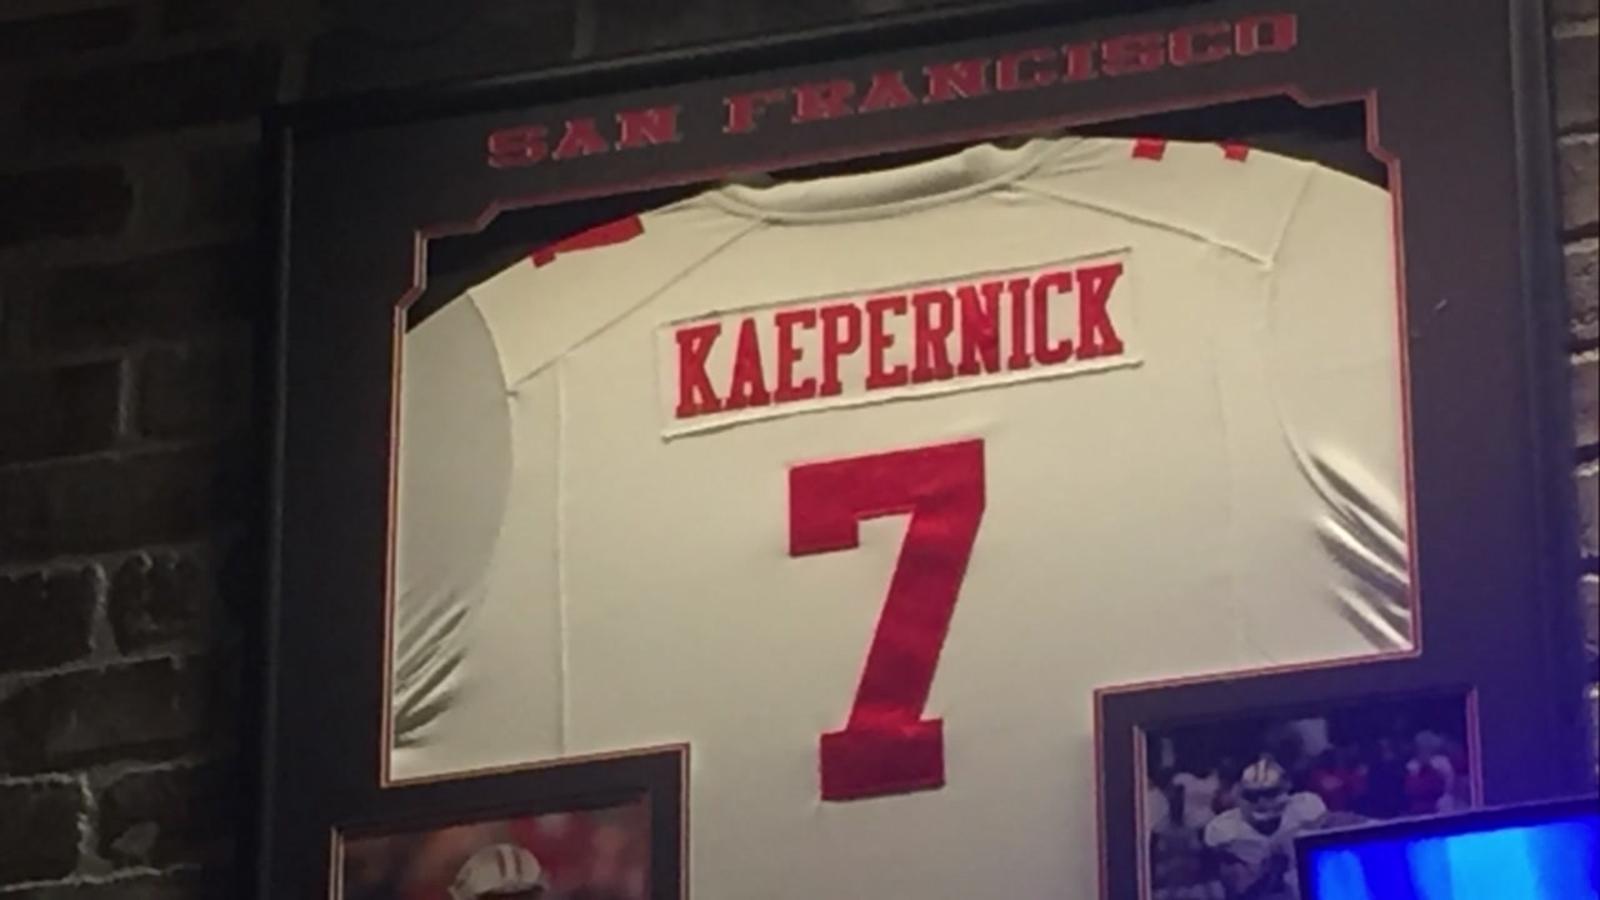 reputable site 6a37b 0a3dd Some say Turlock's 'hometown hero' Kaepernick is no longer welcome